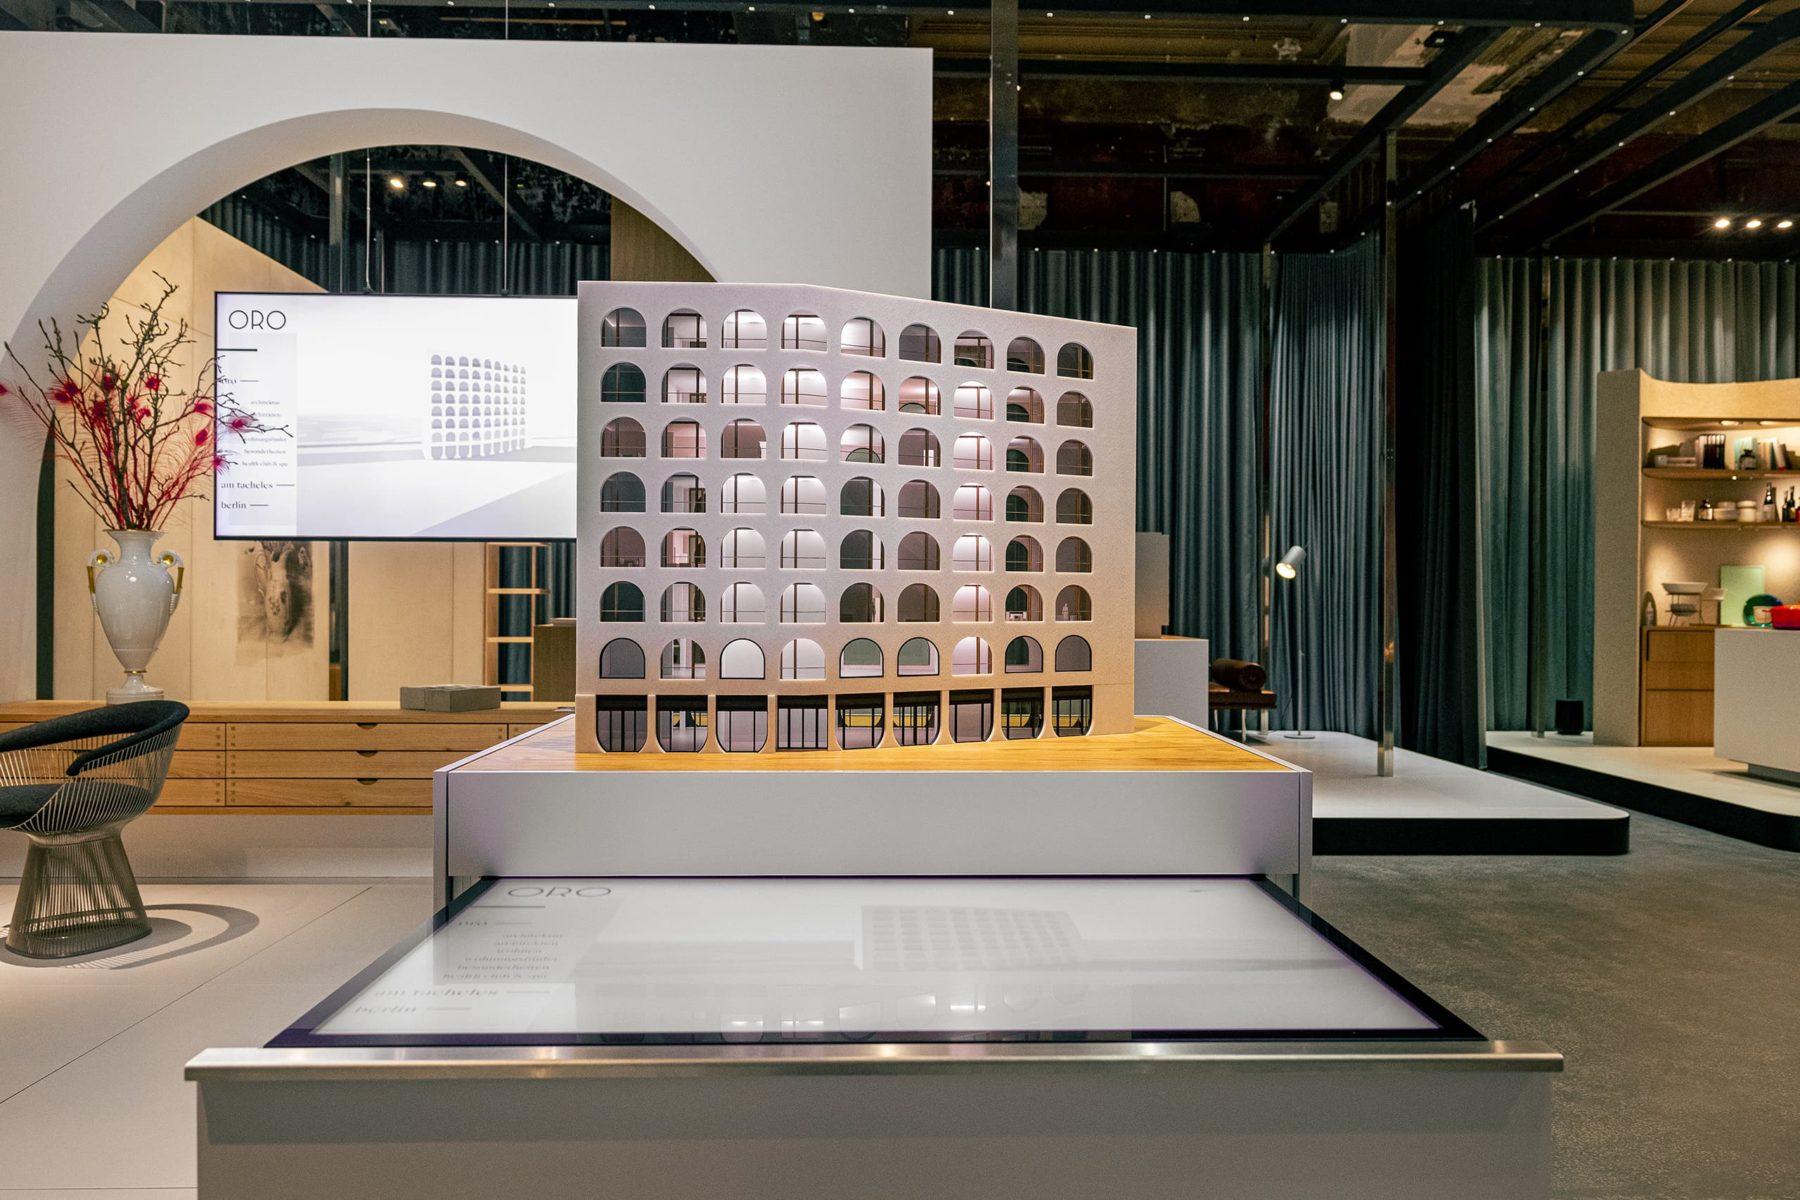 Architekturmodell Oro mit Multitouch Table und Customized Real Estate Applikation, Immobilienprojekt Am Tacheles